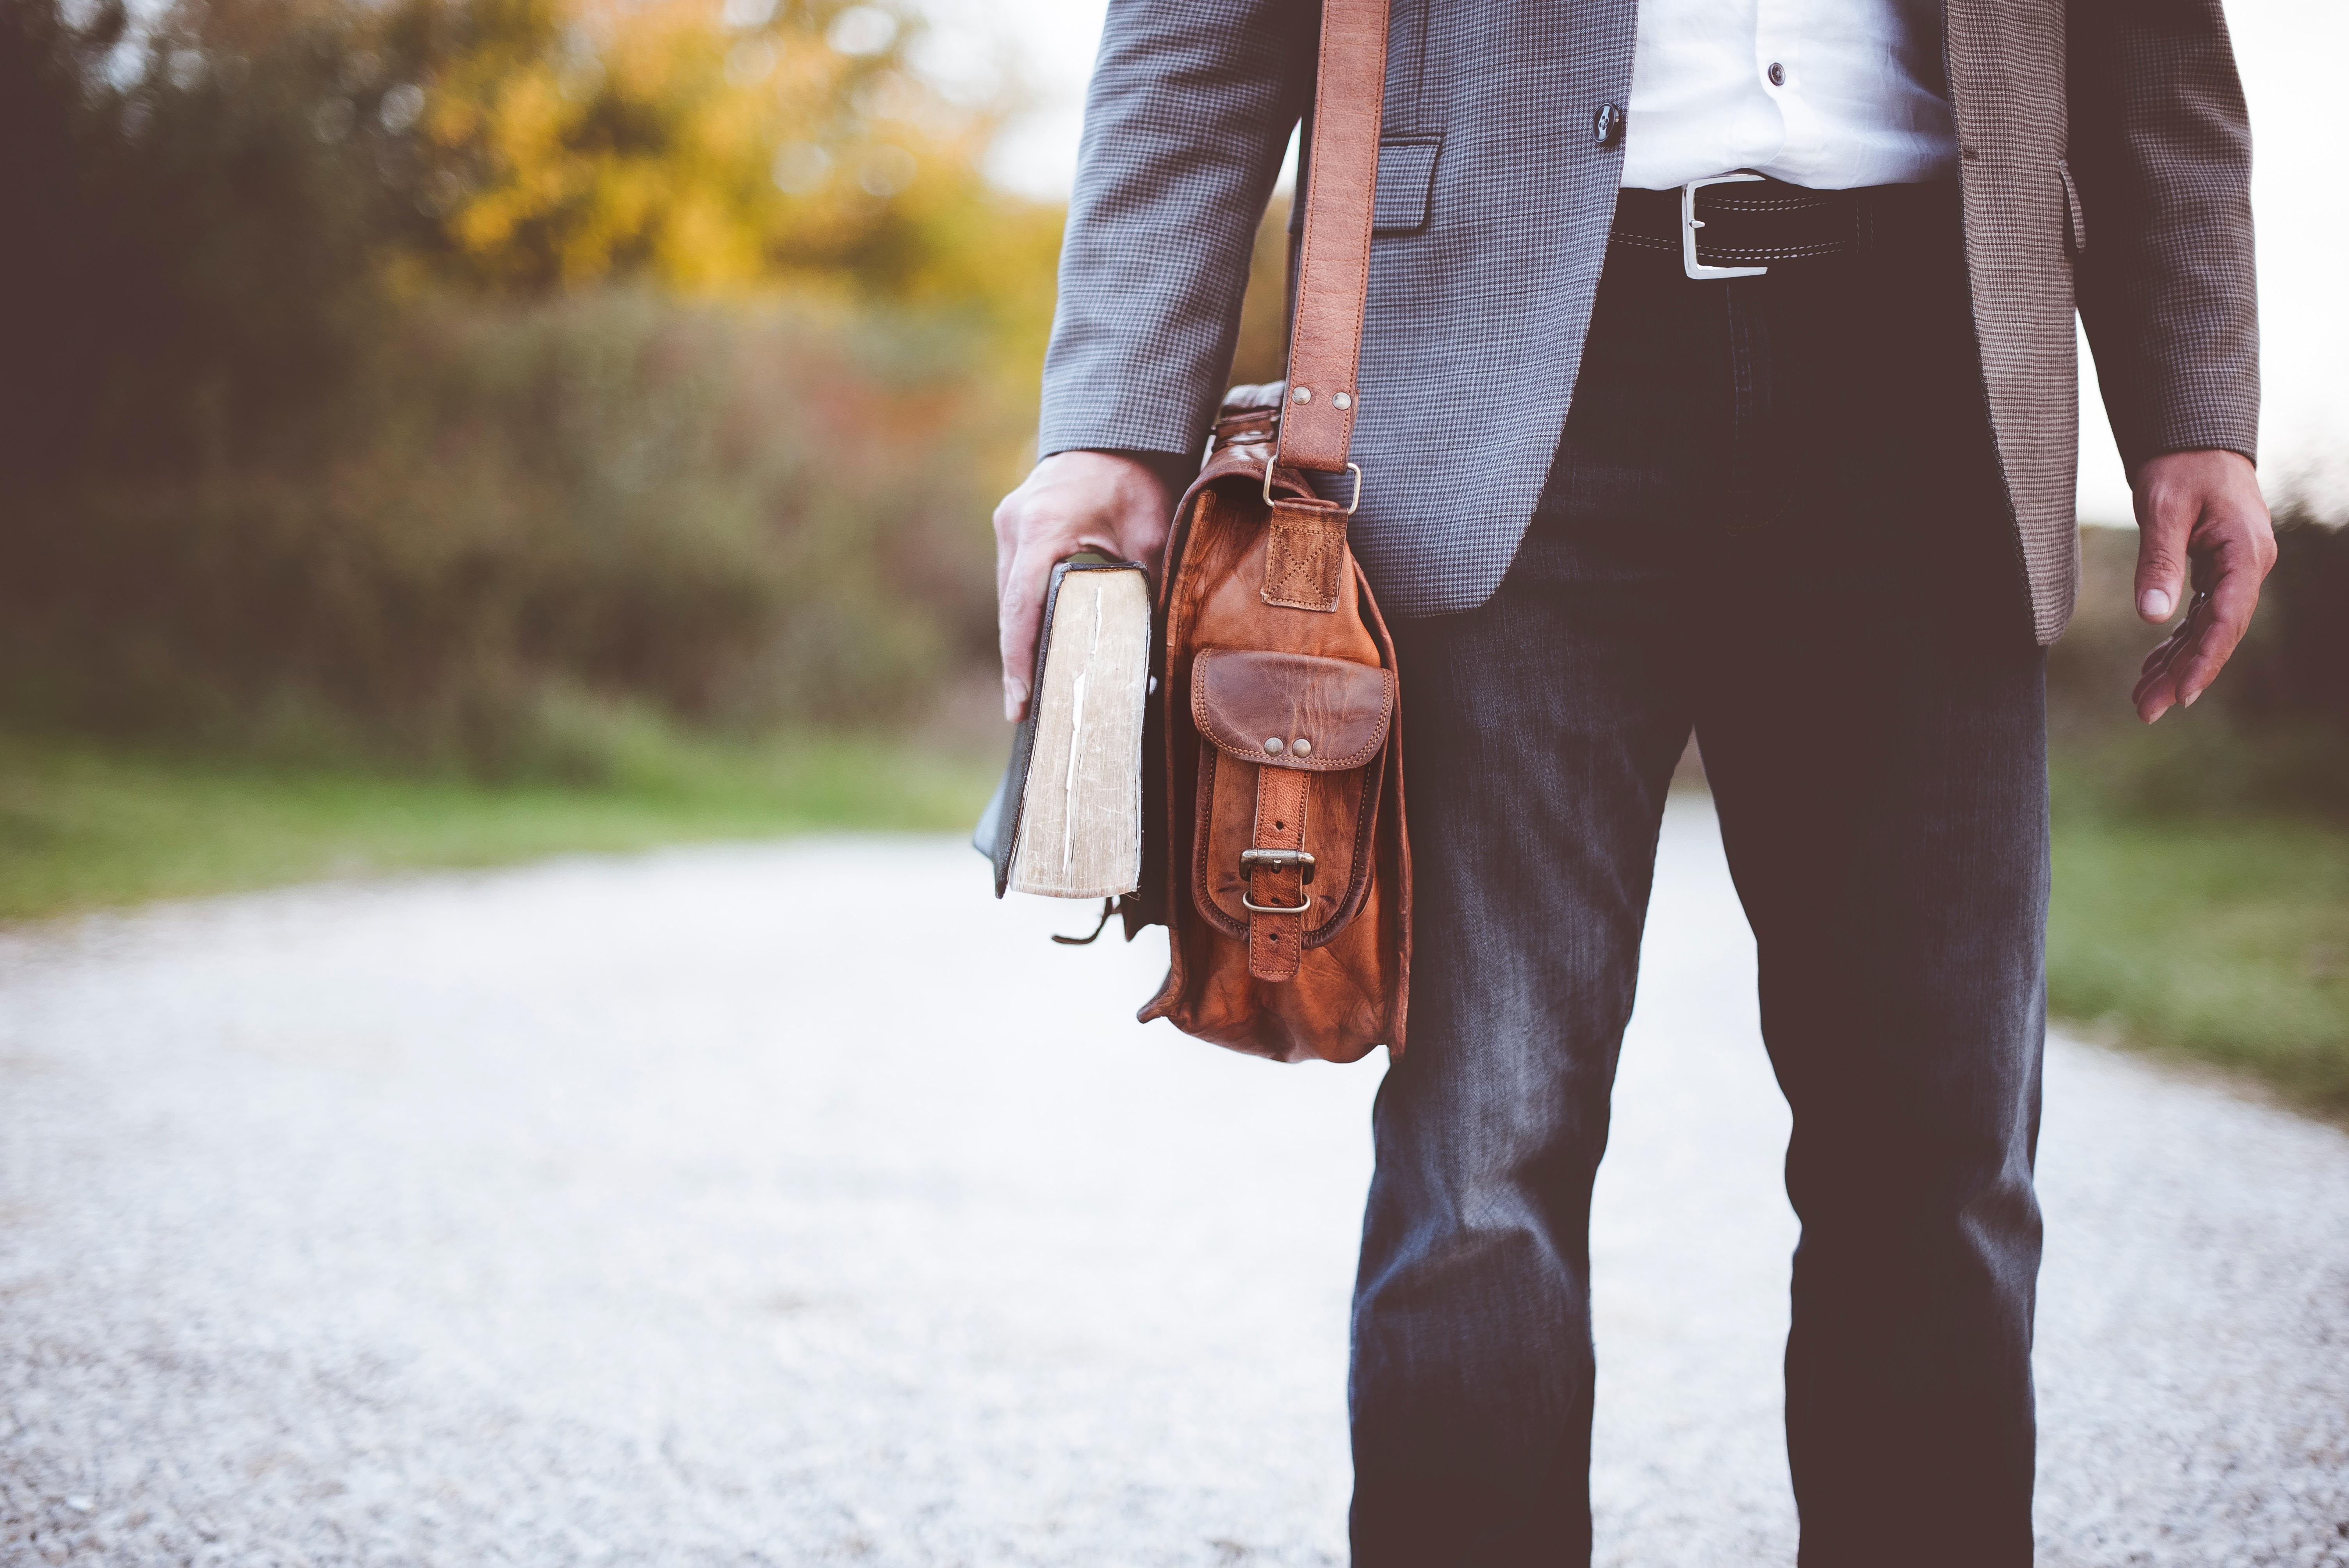 Evangelism and Discipleship